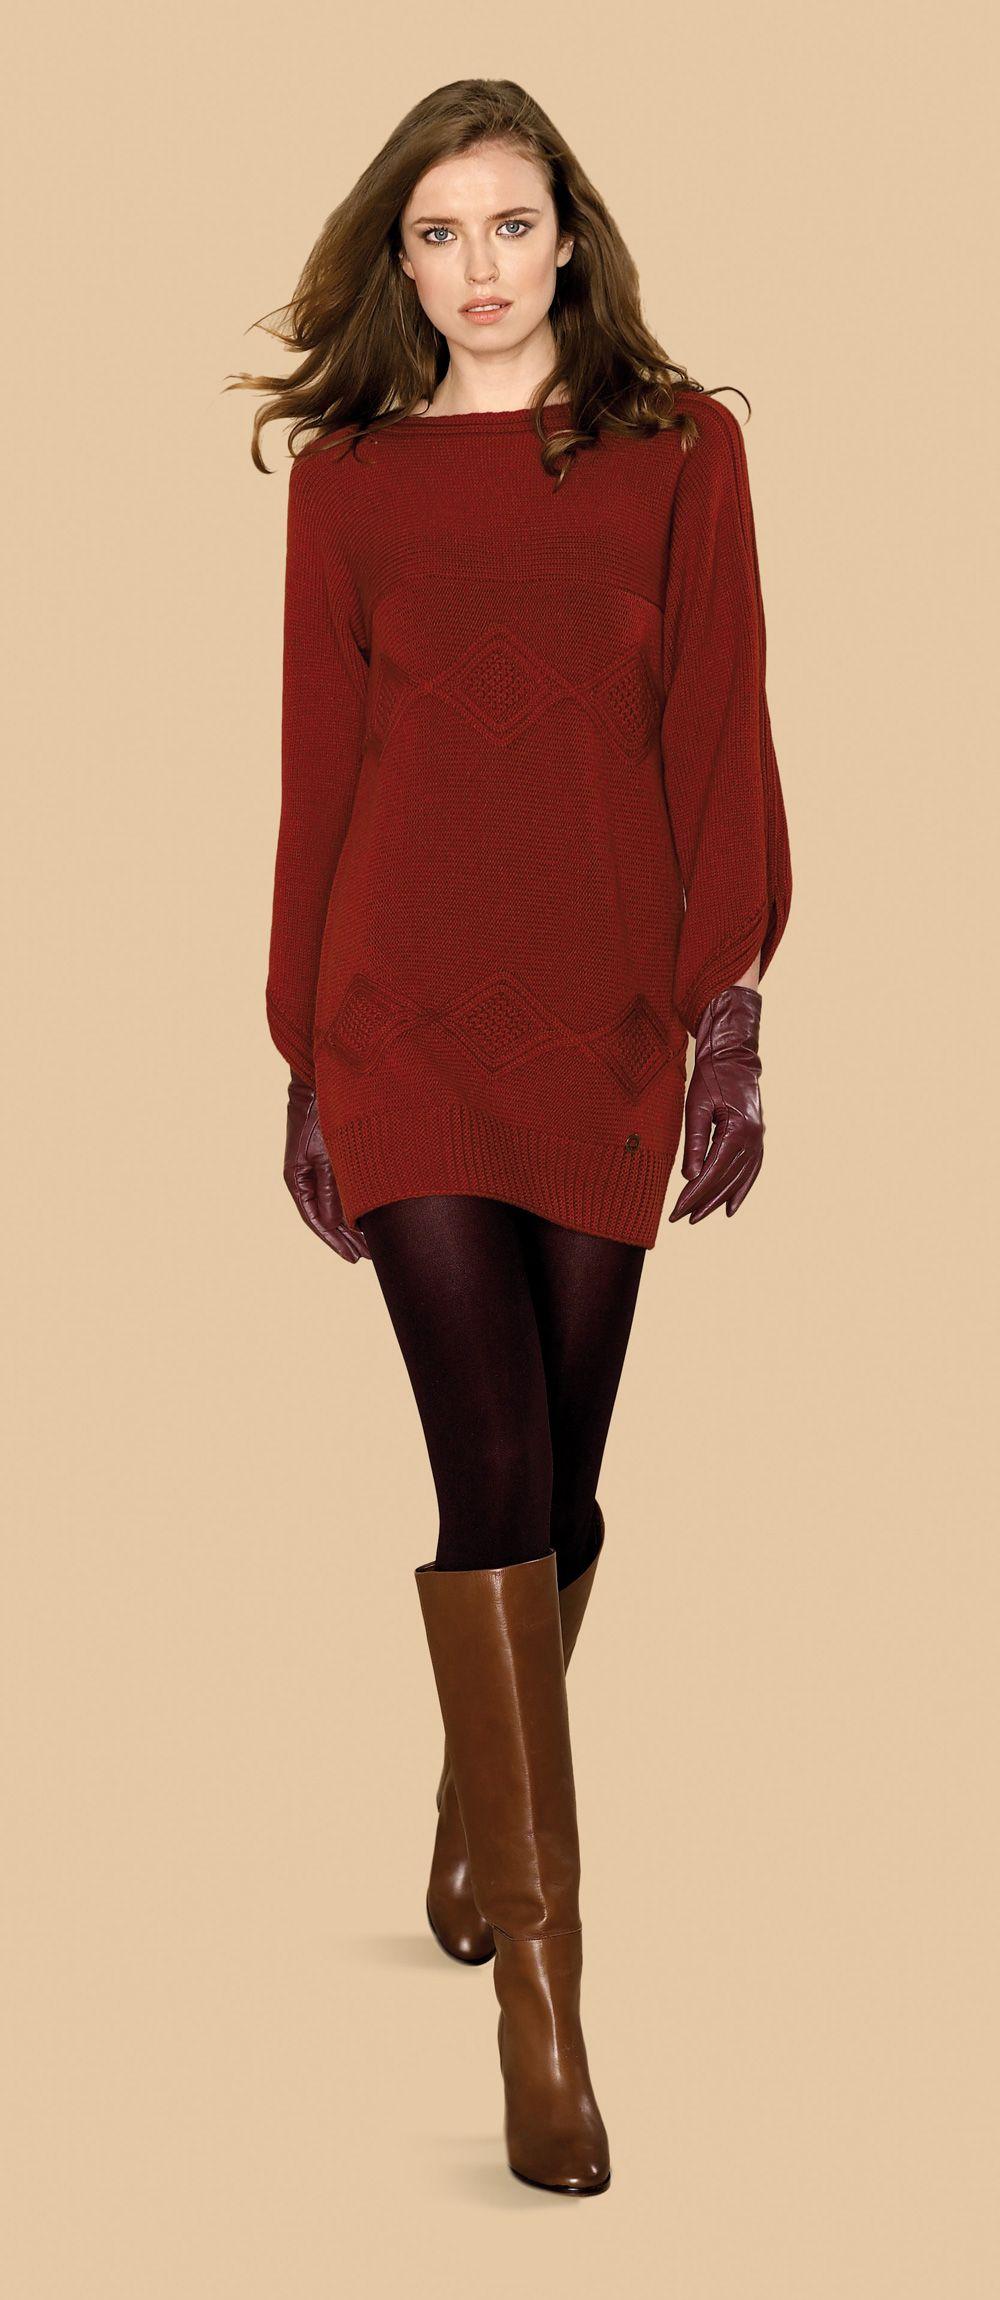 7bf737dabe2ef Vestido de manga larga y lana de color burgundy  trend  fall  winter  2013